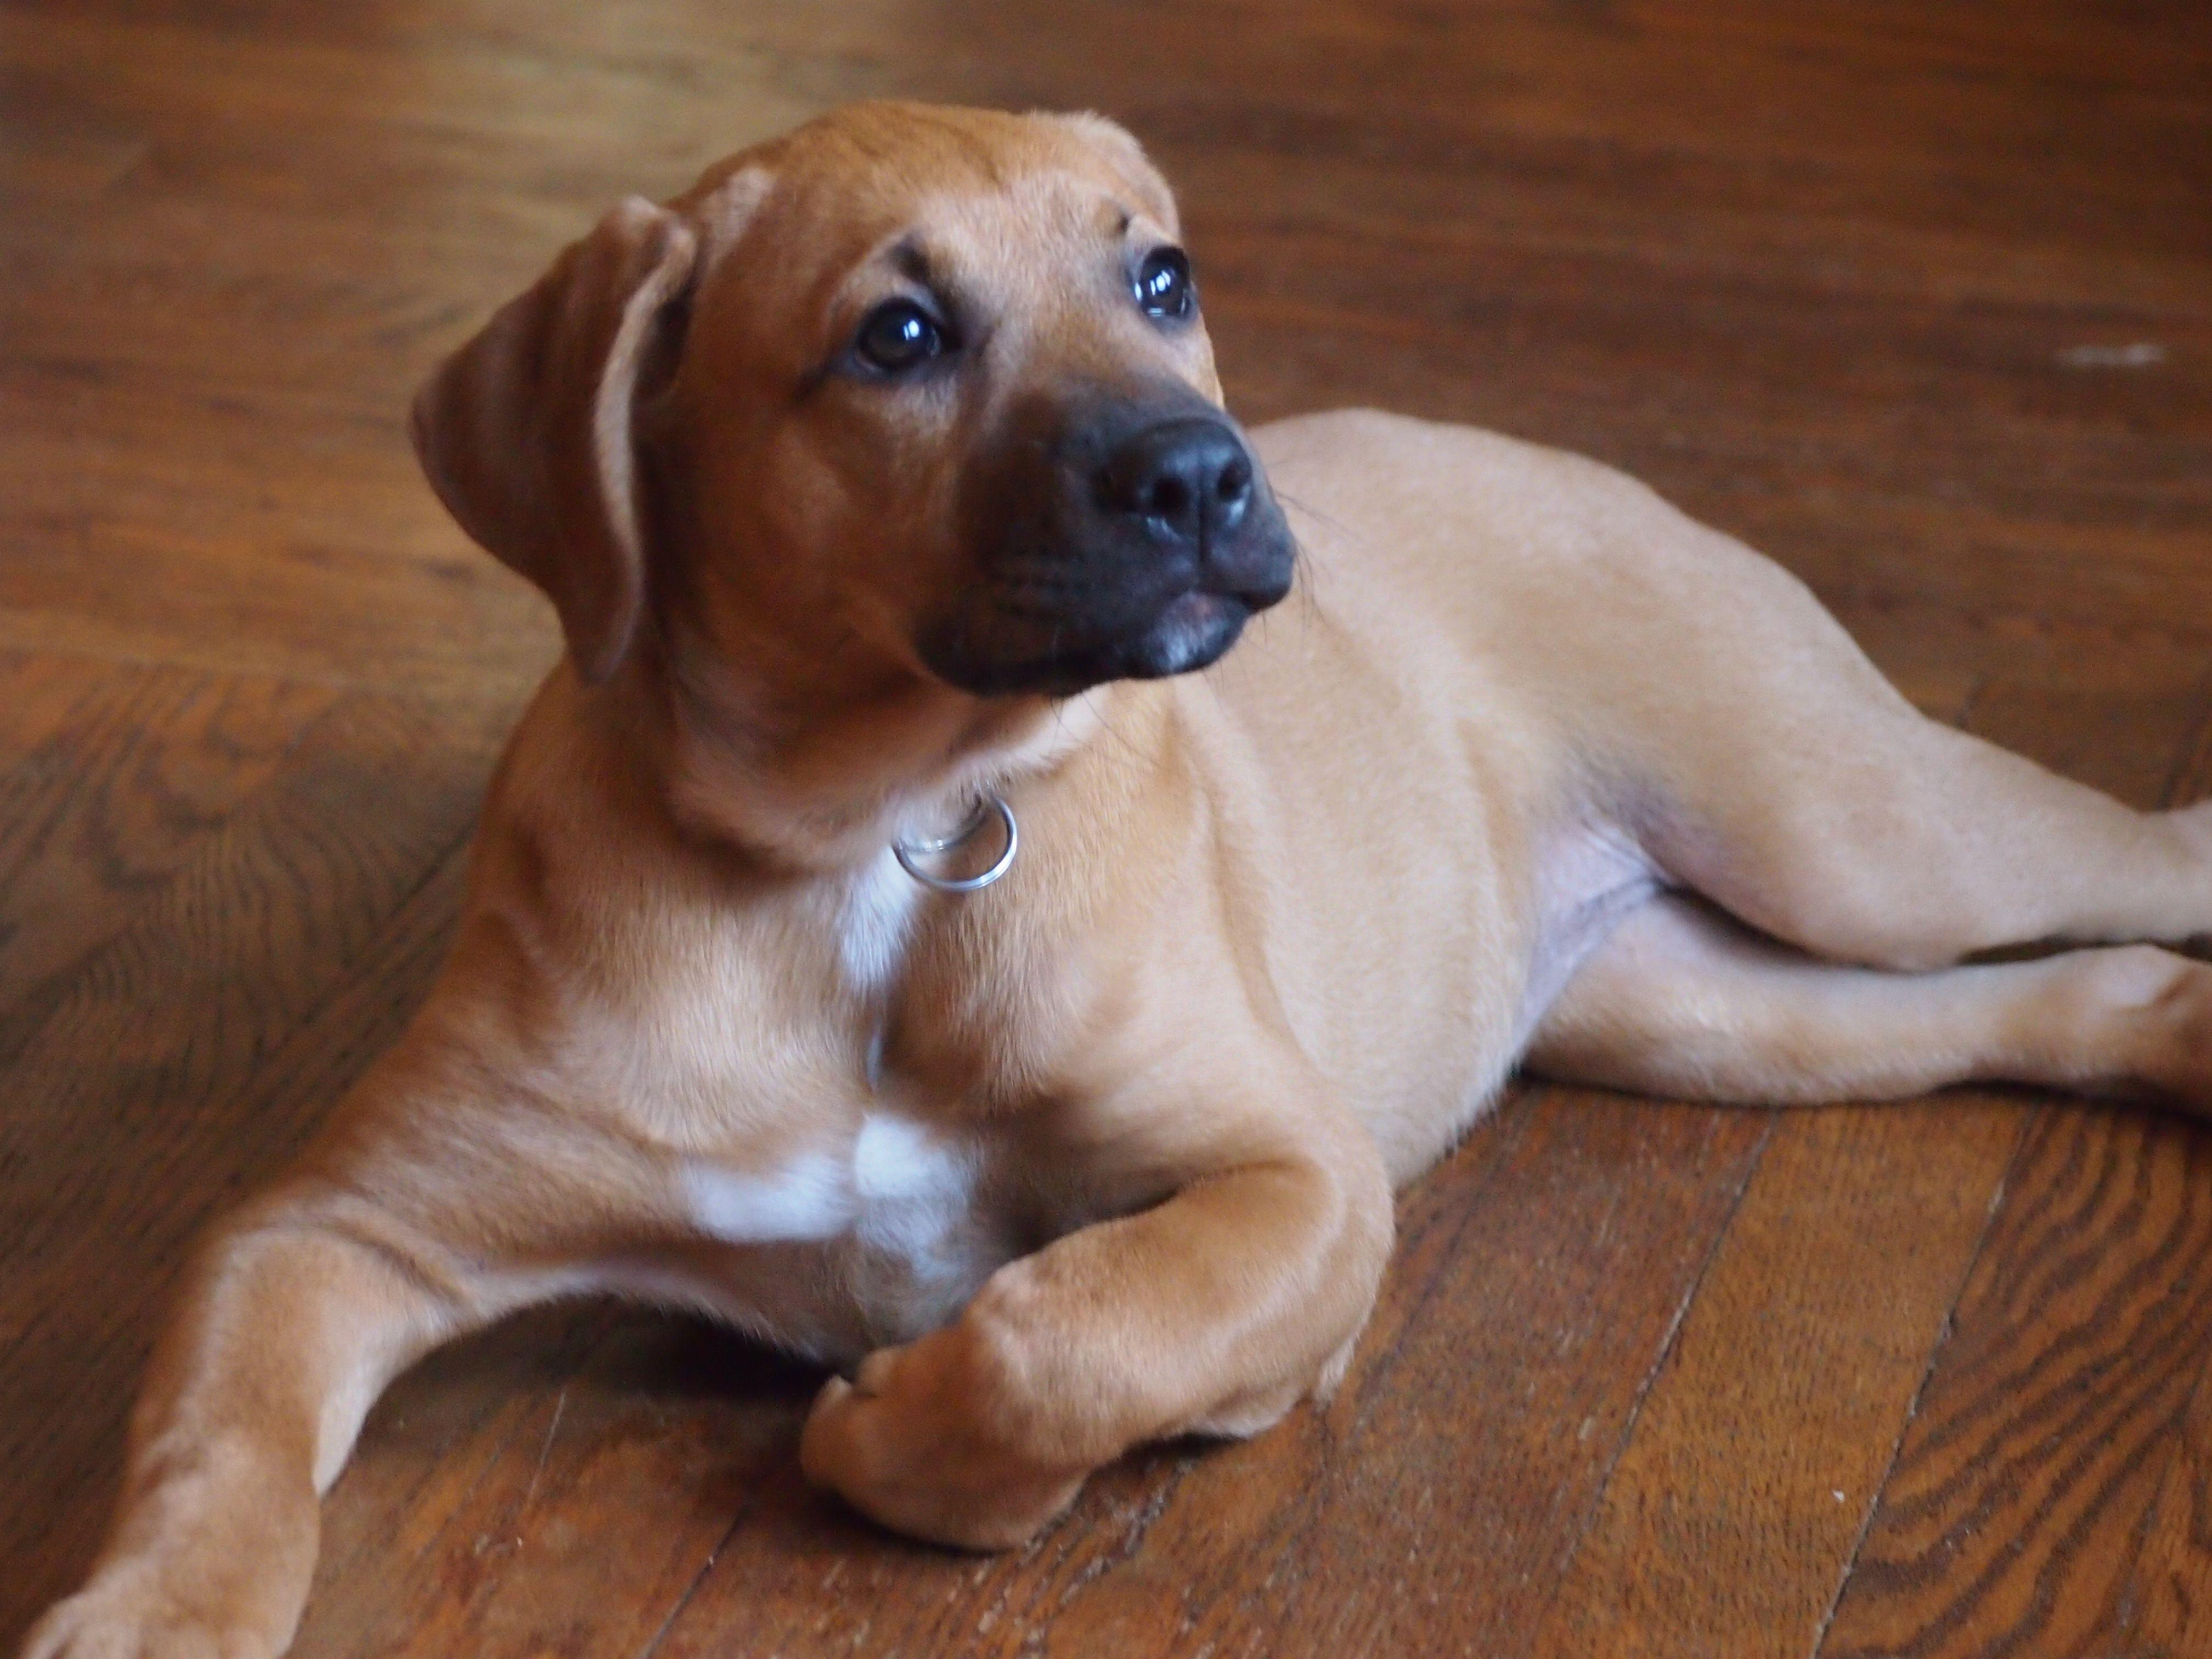 Cool Rhodesian Ridgeback Brown Adorable Dog - 2145a0a2cea34861faf48a6954730f89  HD_259999  .jpg